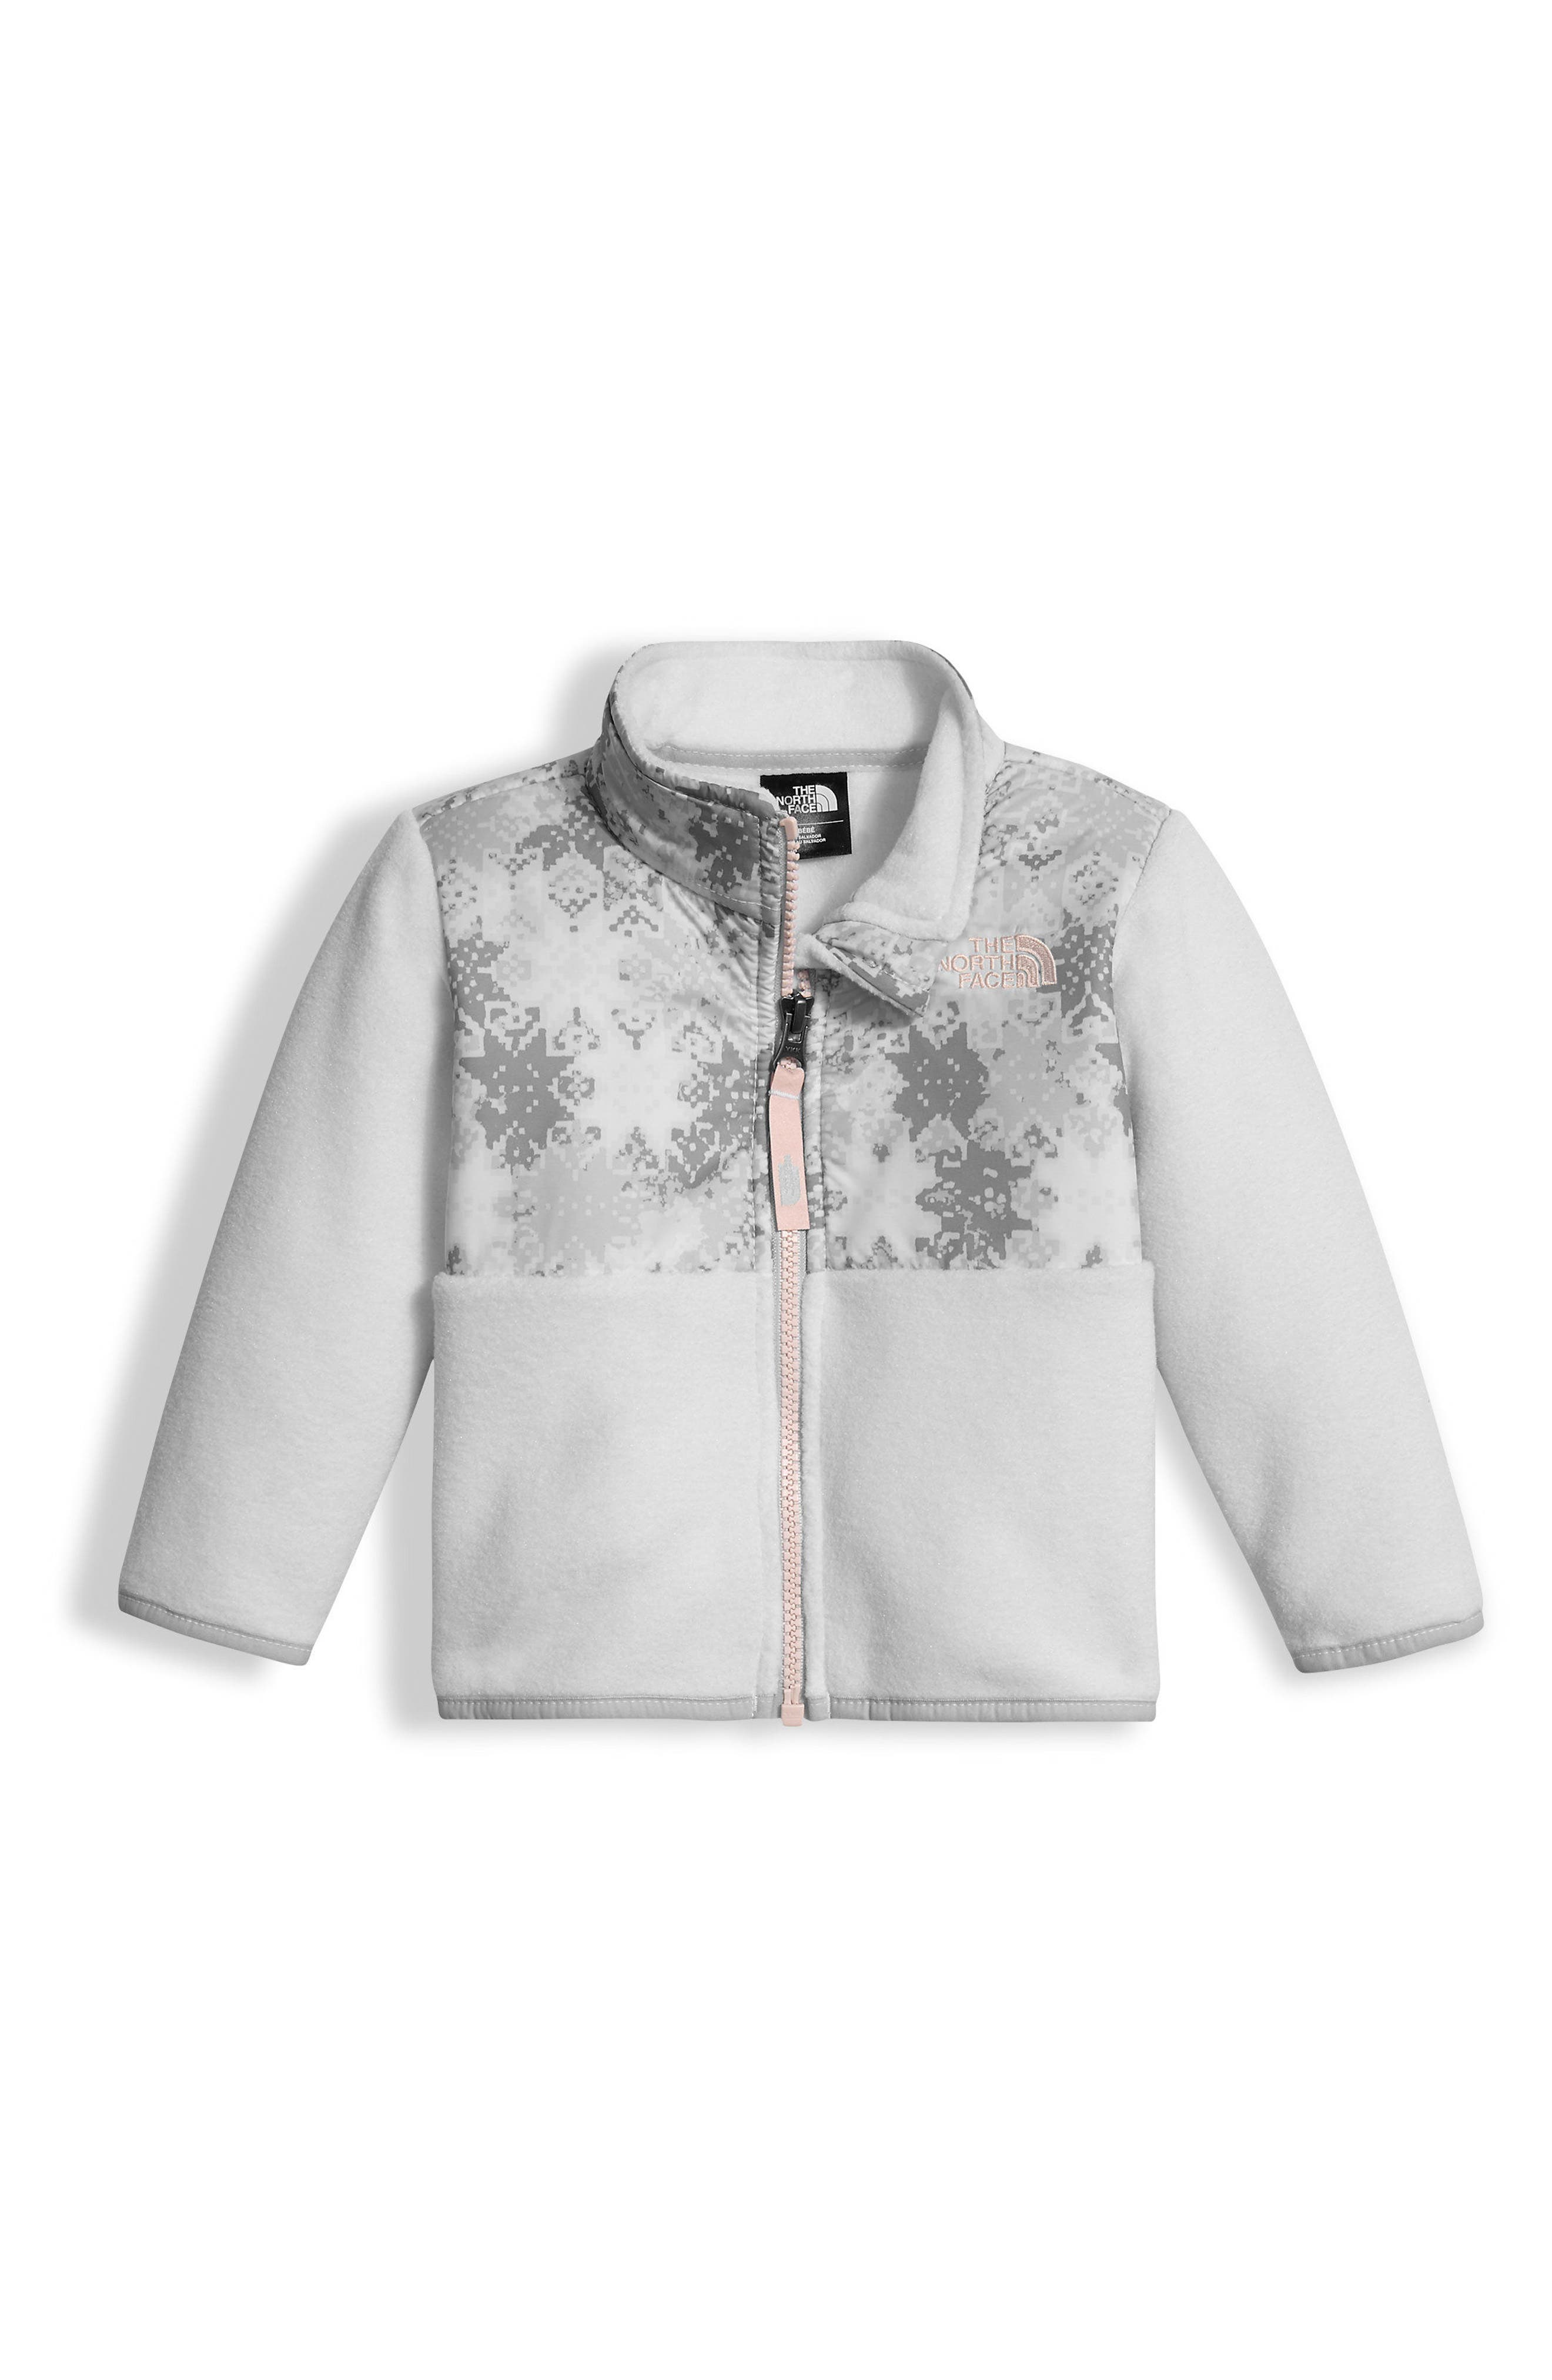 'Denali' Recycled Fleece Jacket,                         Main,                         color, Snowflake/ Fair Isle Print